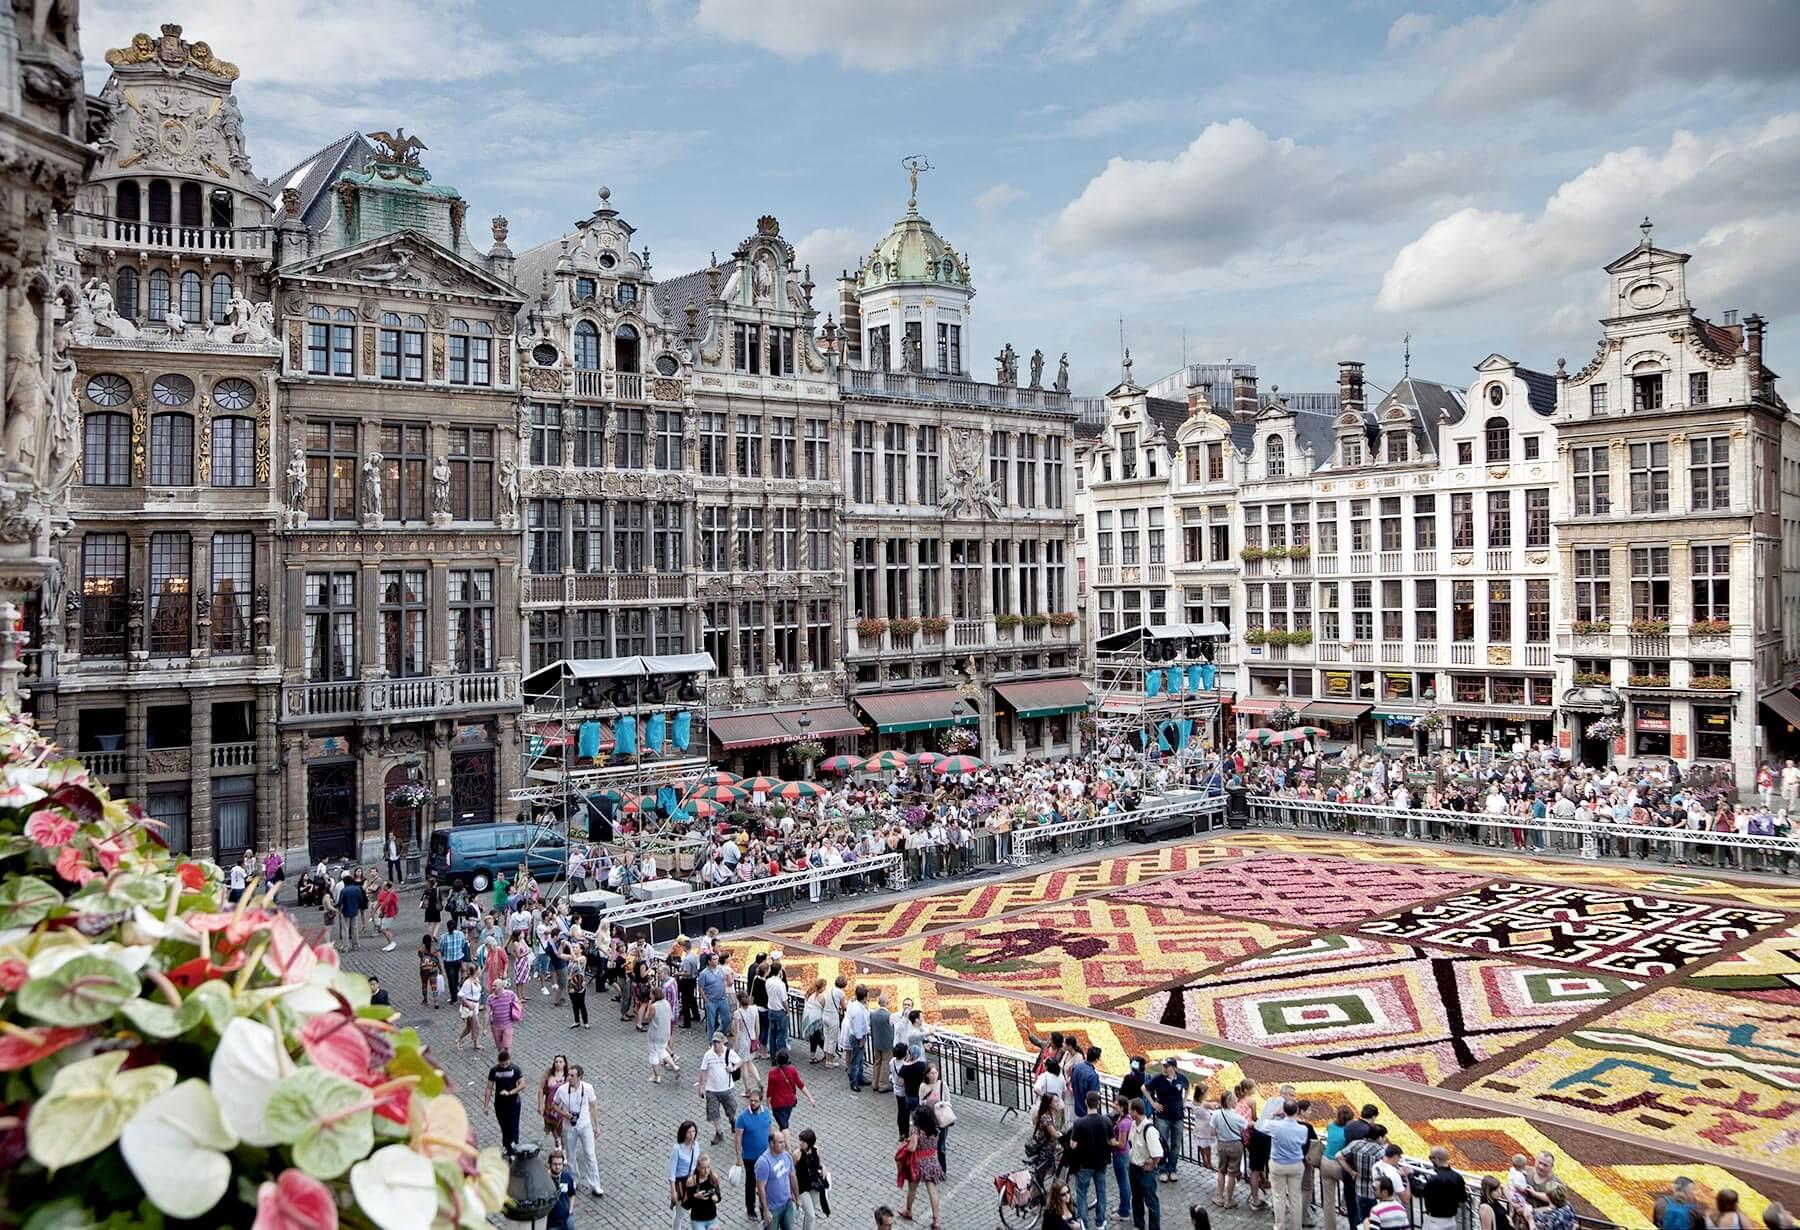 visiter Bruxelles : festivals